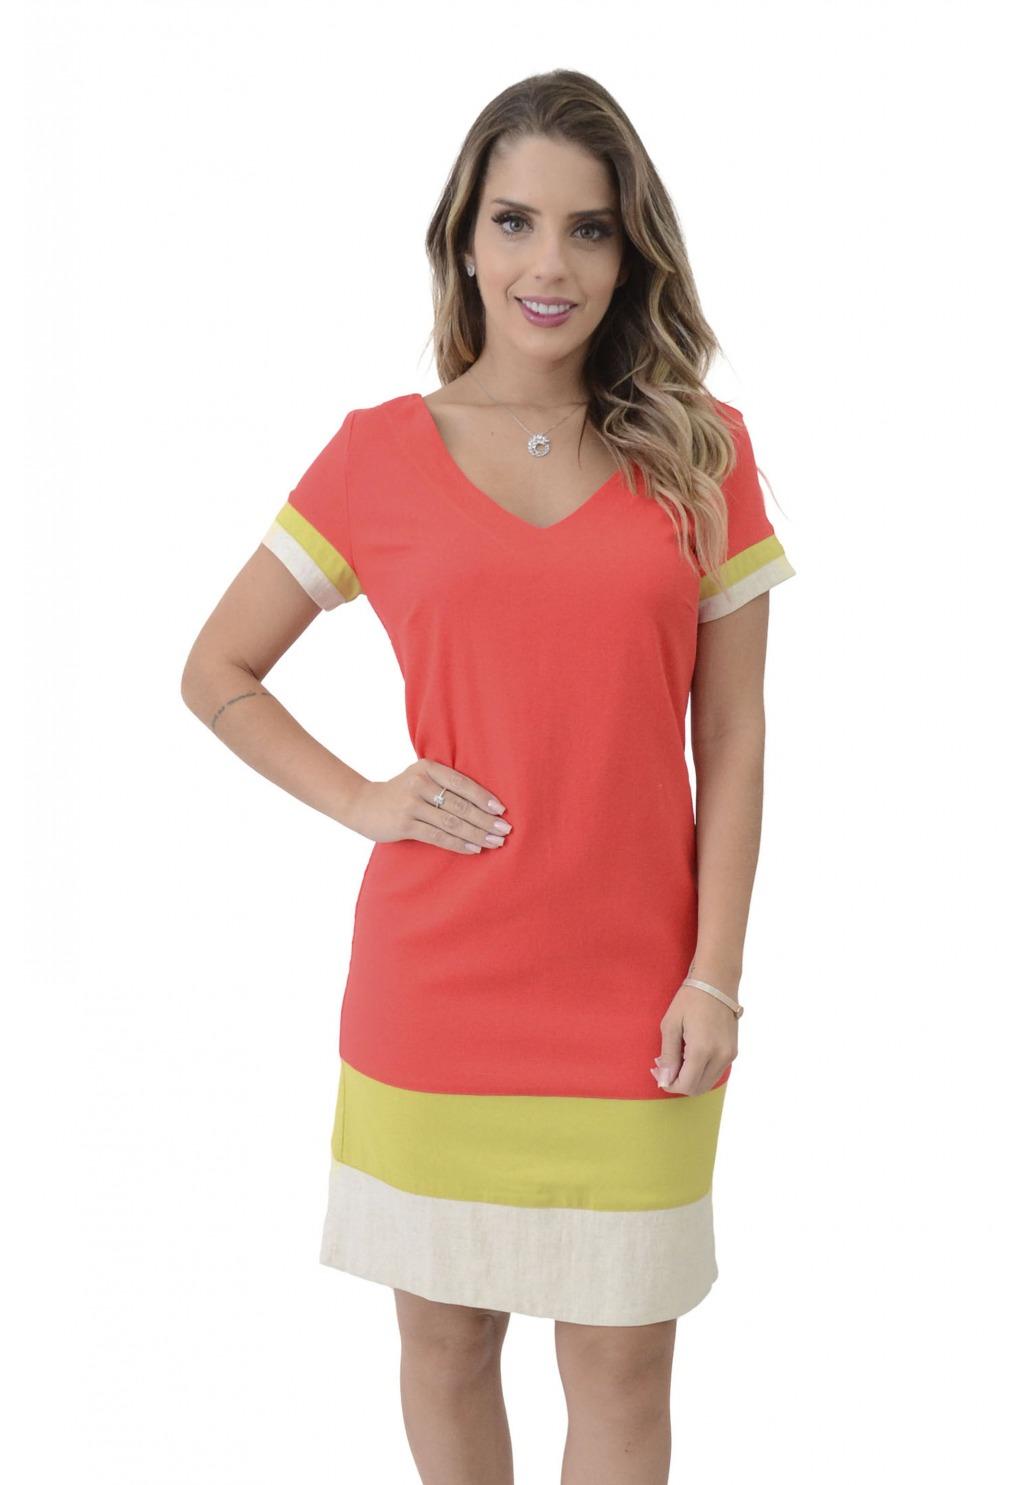 Vestido Mamorena com recortes coloridos